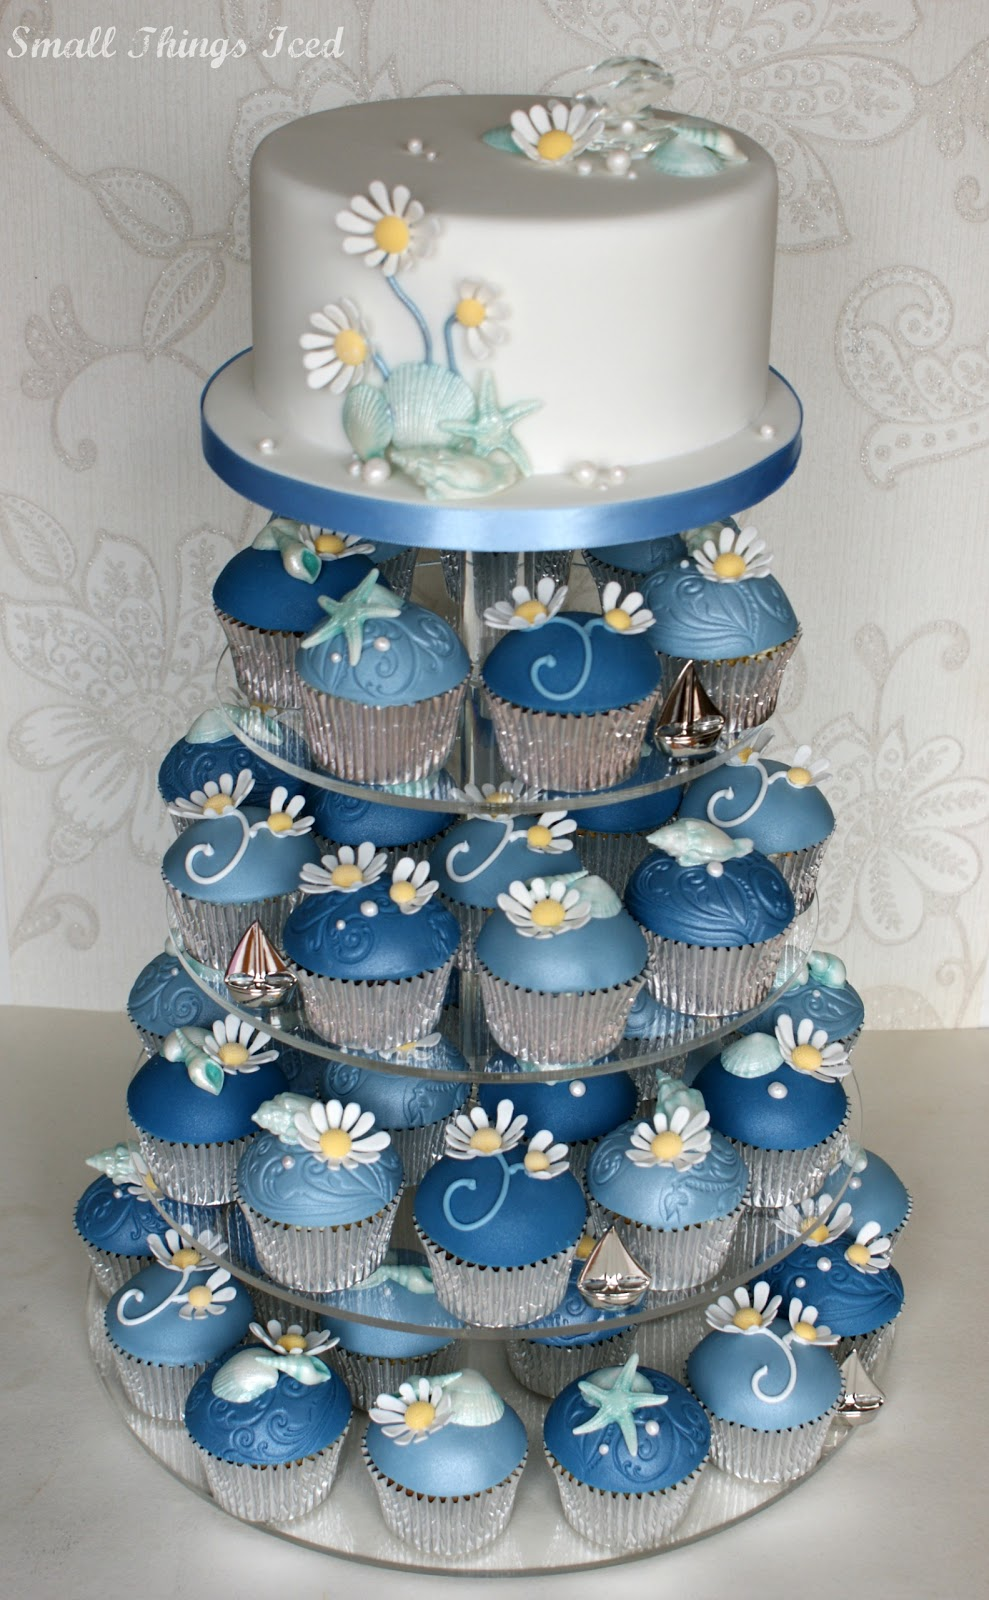 Small Things Iced Daisy Amp Sea Shell Cupcake Tower 2